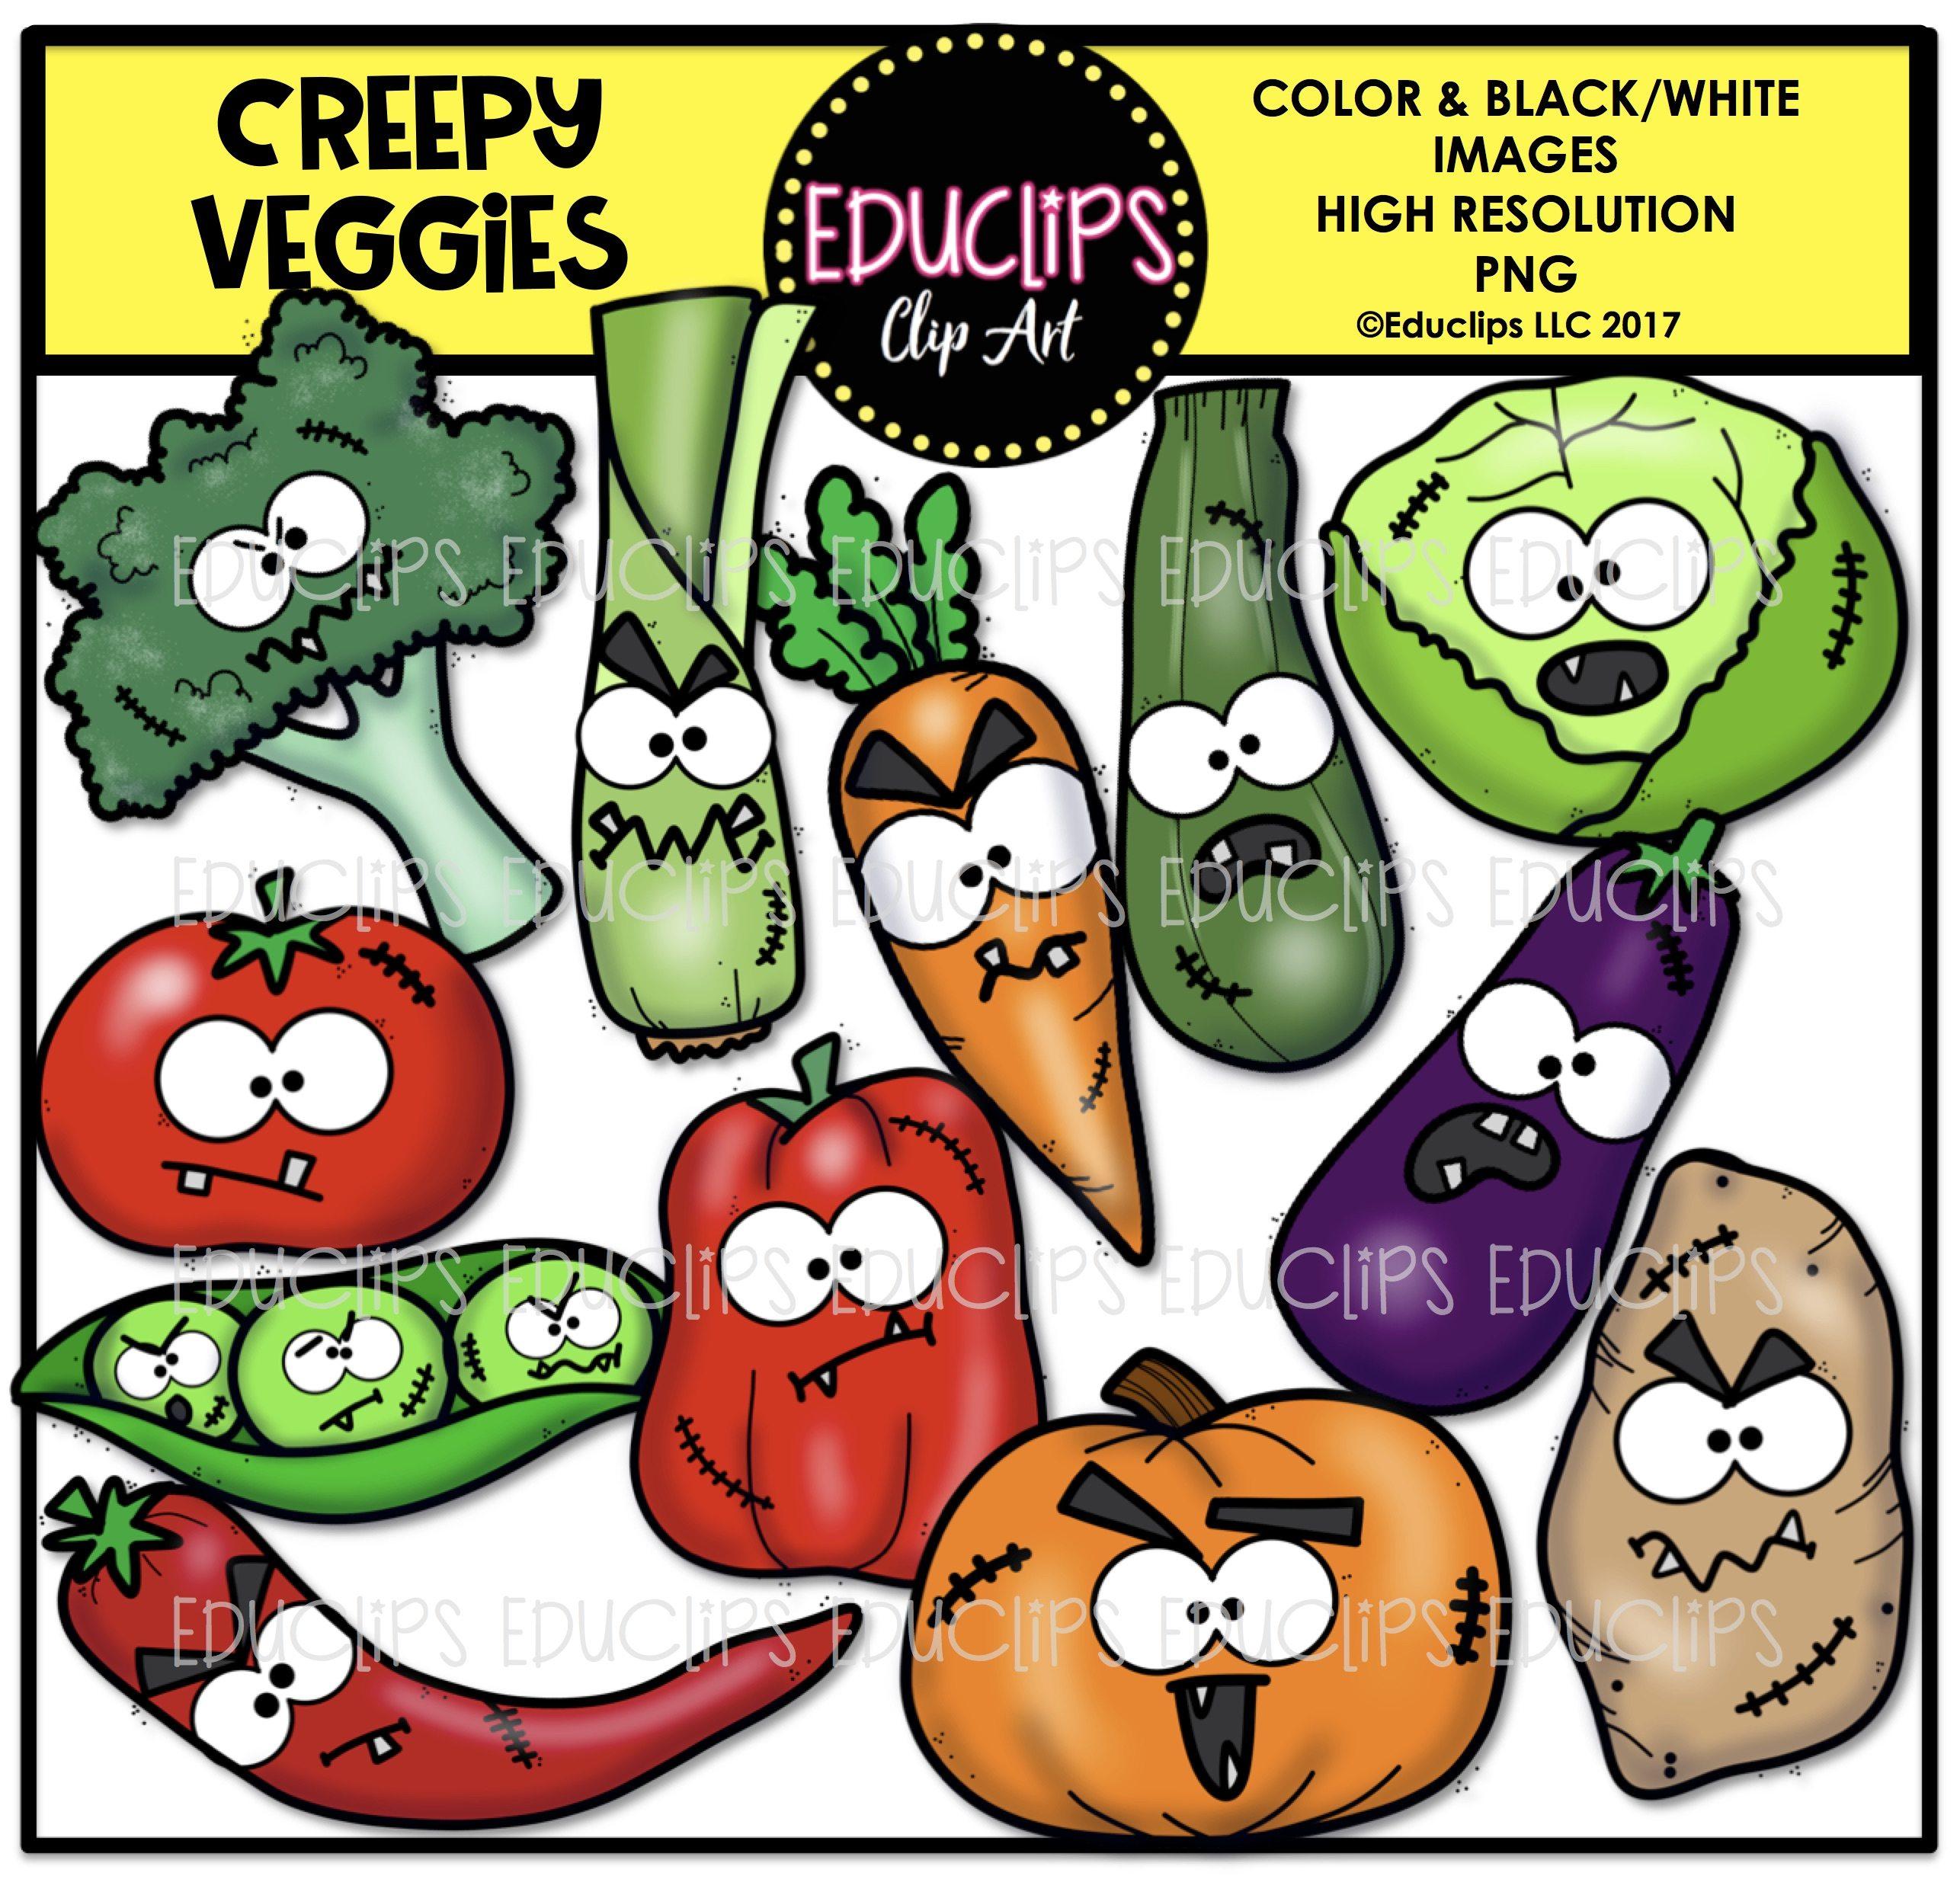 Cabbage clipart educlips. Creepy veggies clip art